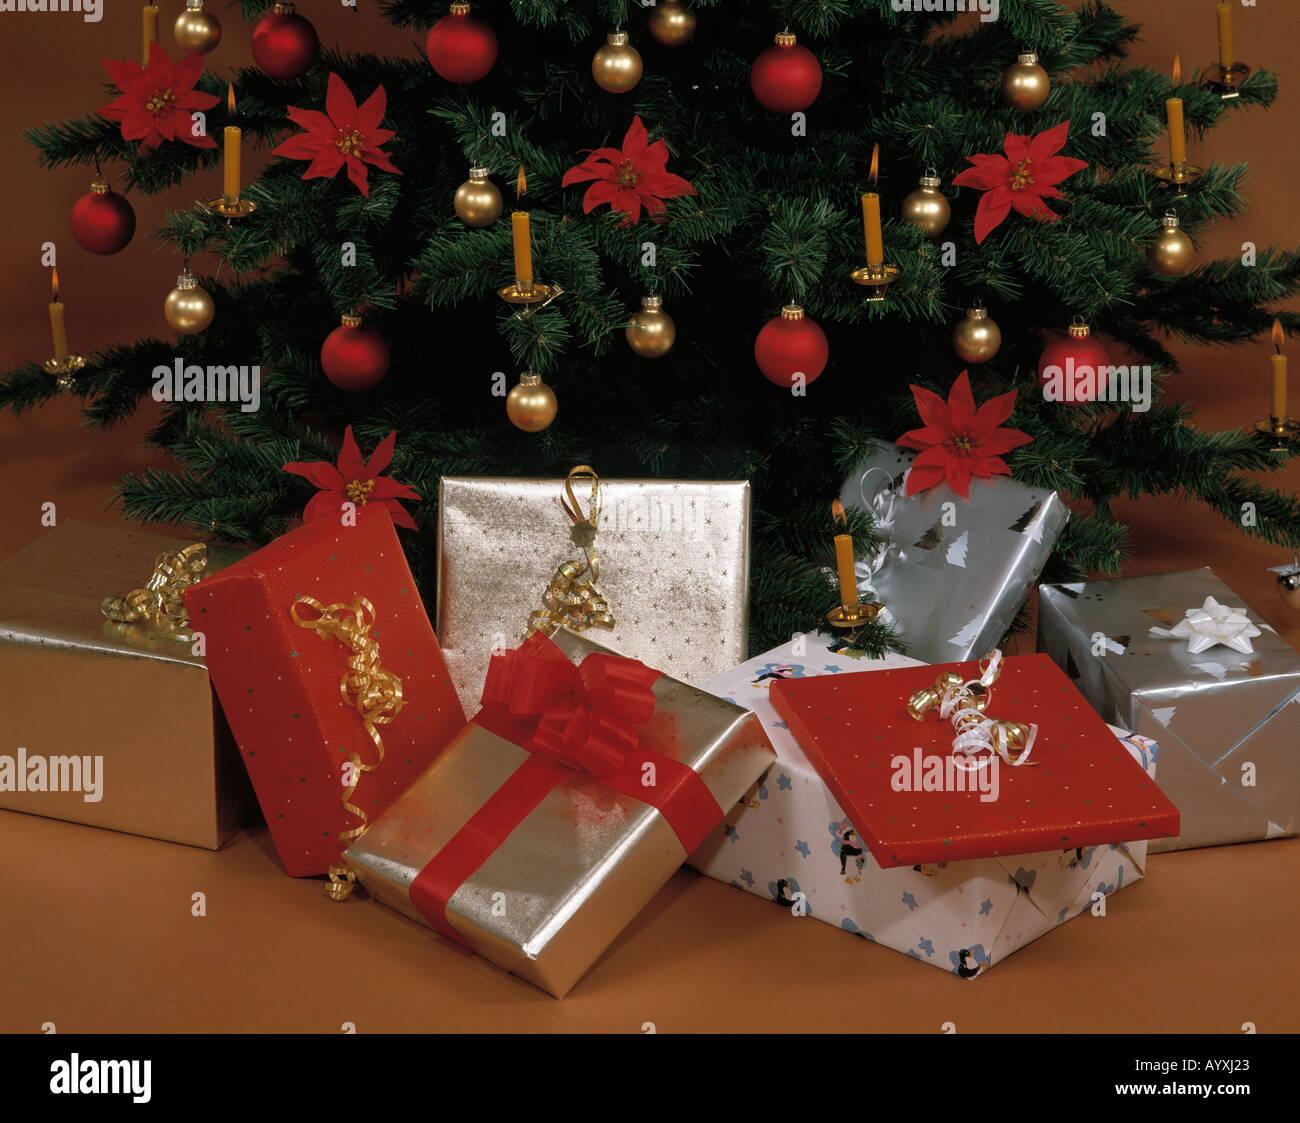 Christmas, decorated Christmas tree, presents - Stock Image